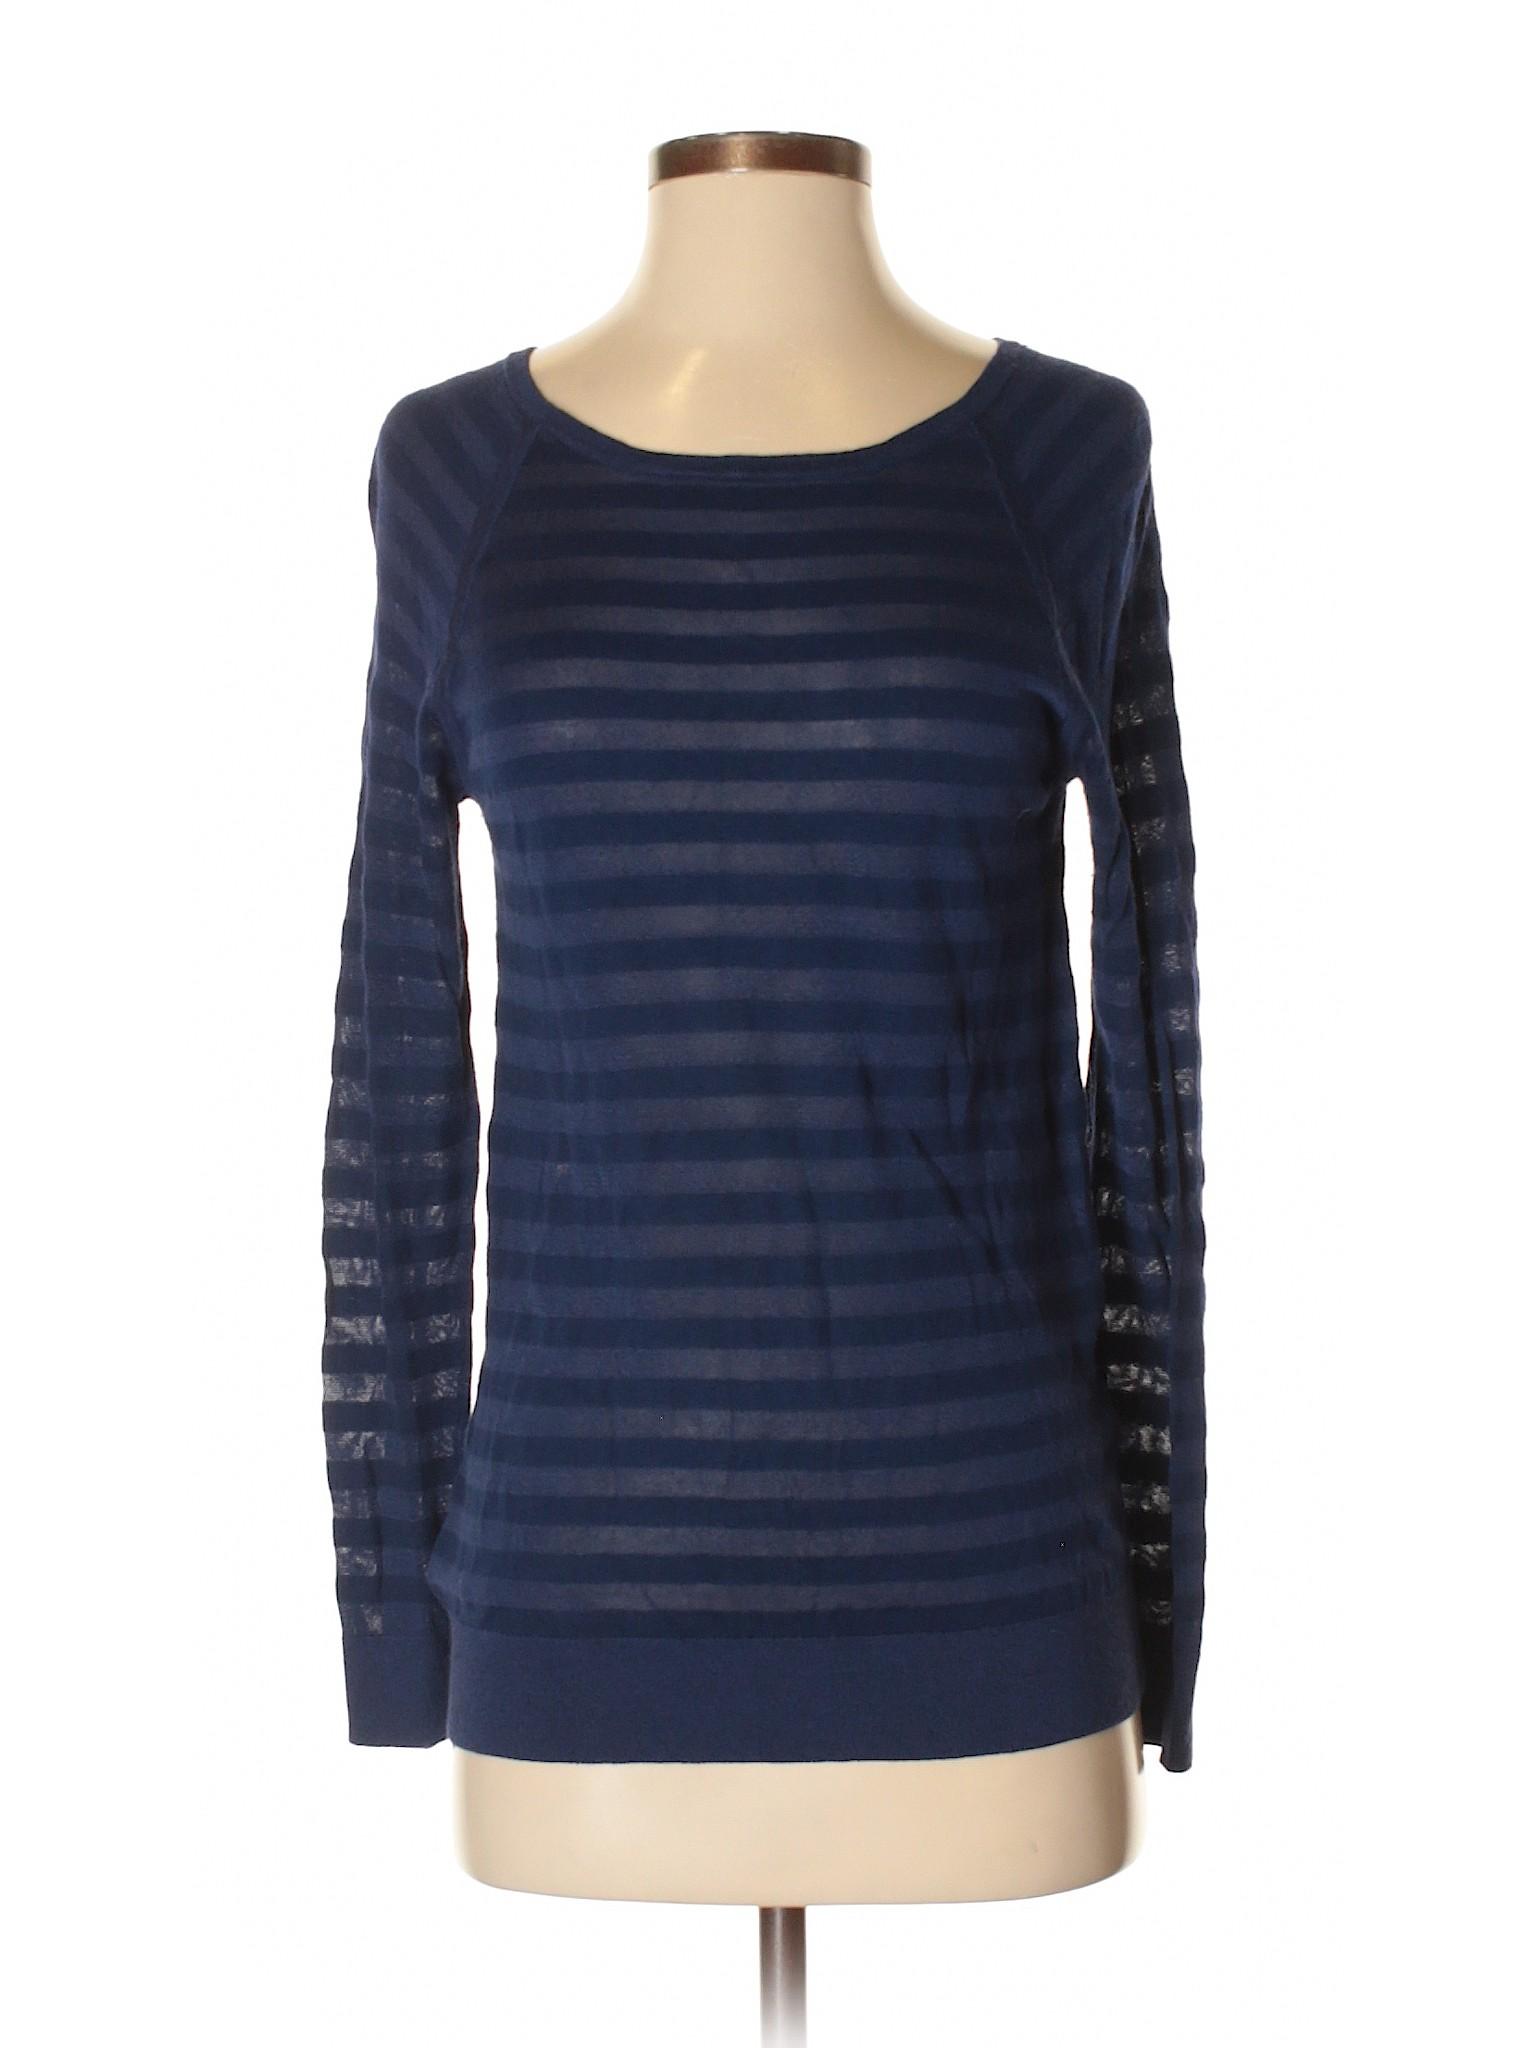 Sweater Pullover Taylor Ann LOFT Boutique qwagxC